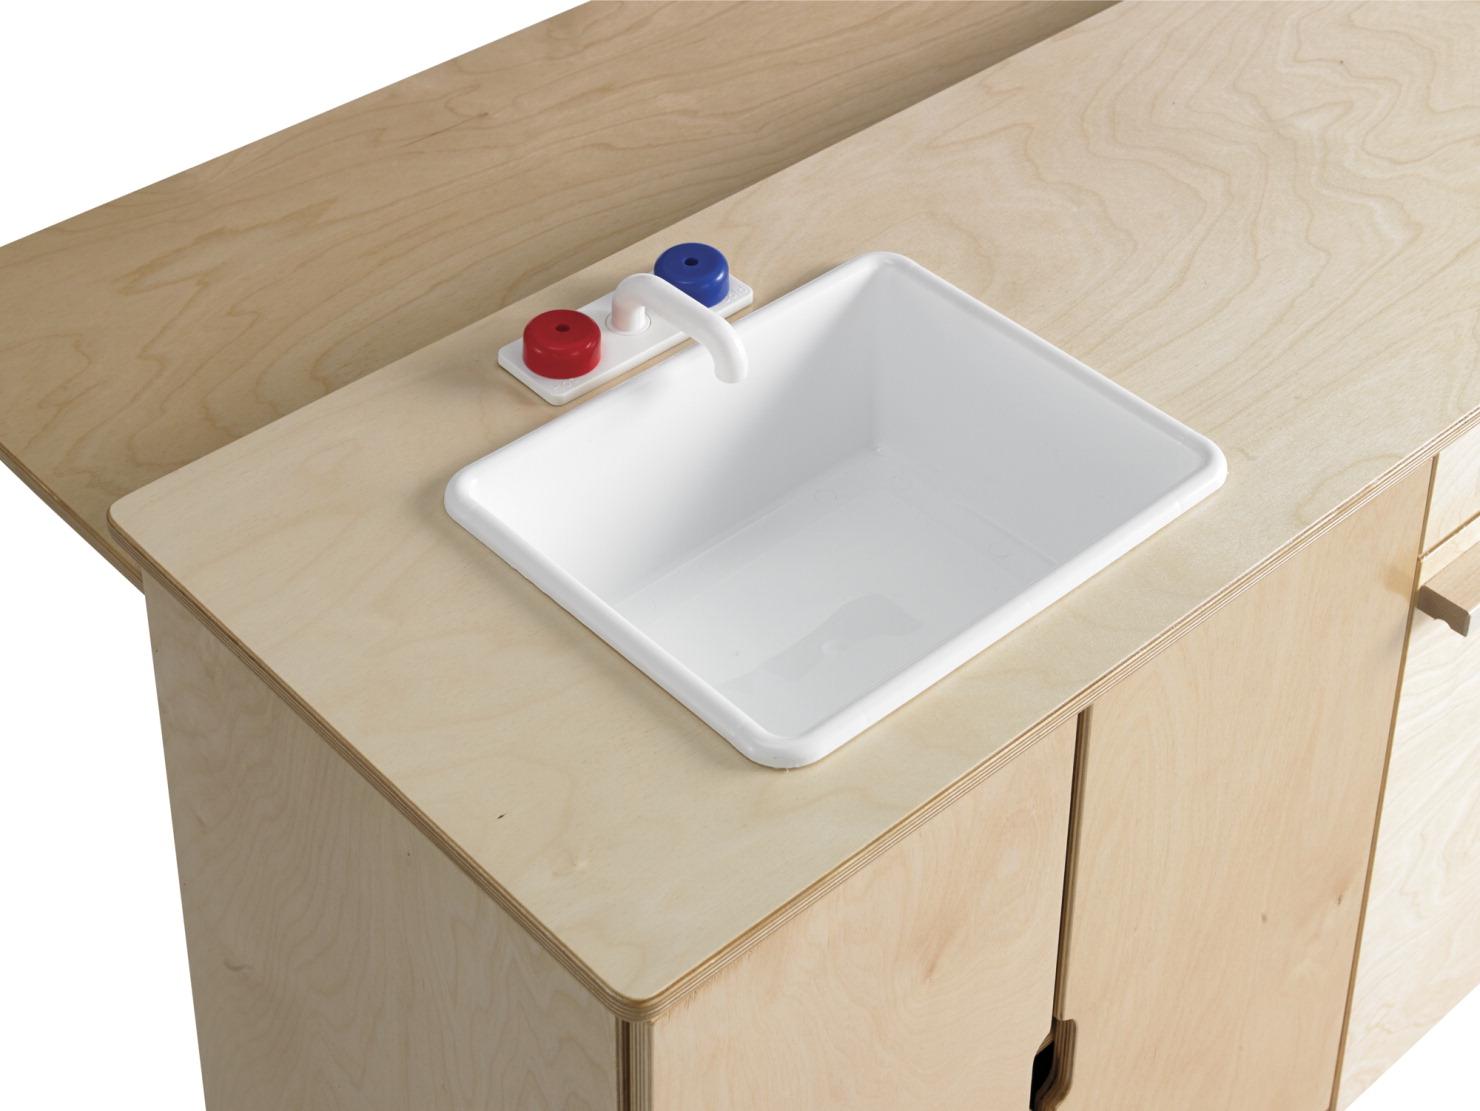 Childcraft Modern Kitchen Sink And Dishwasher Combo